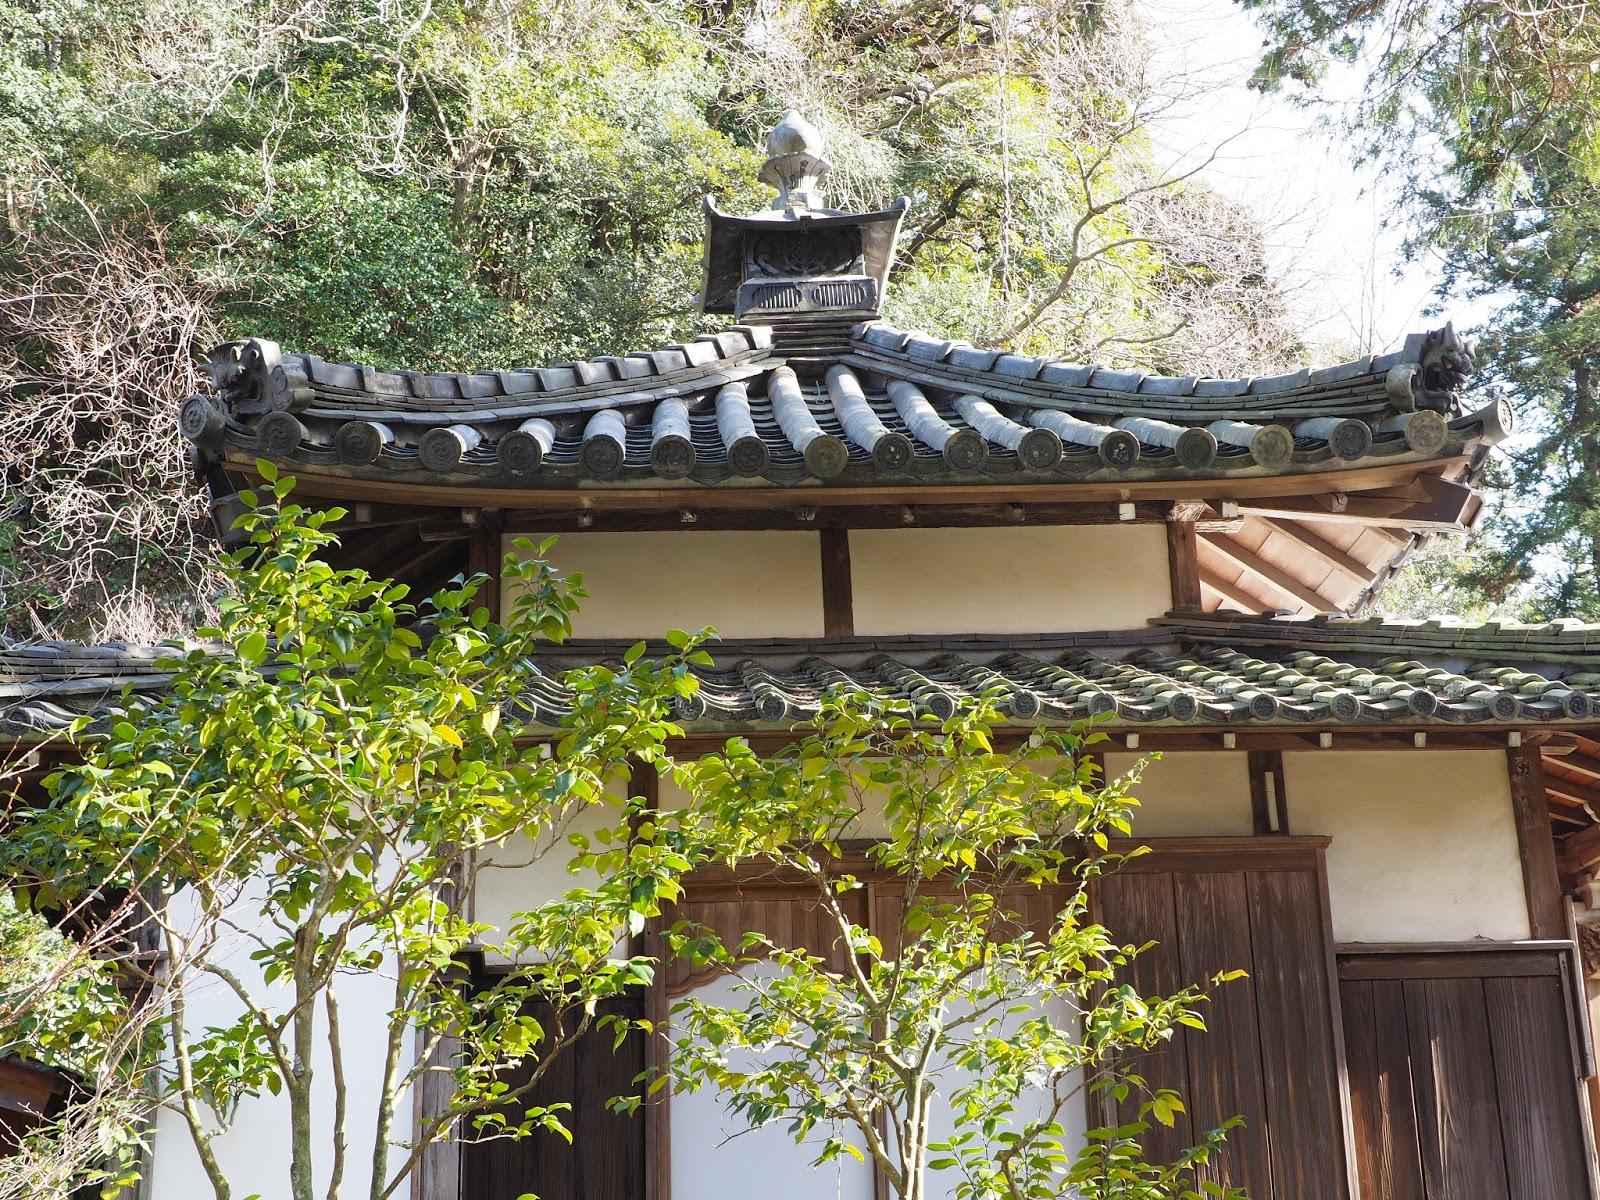 japan tokyo kamakura kanagawa